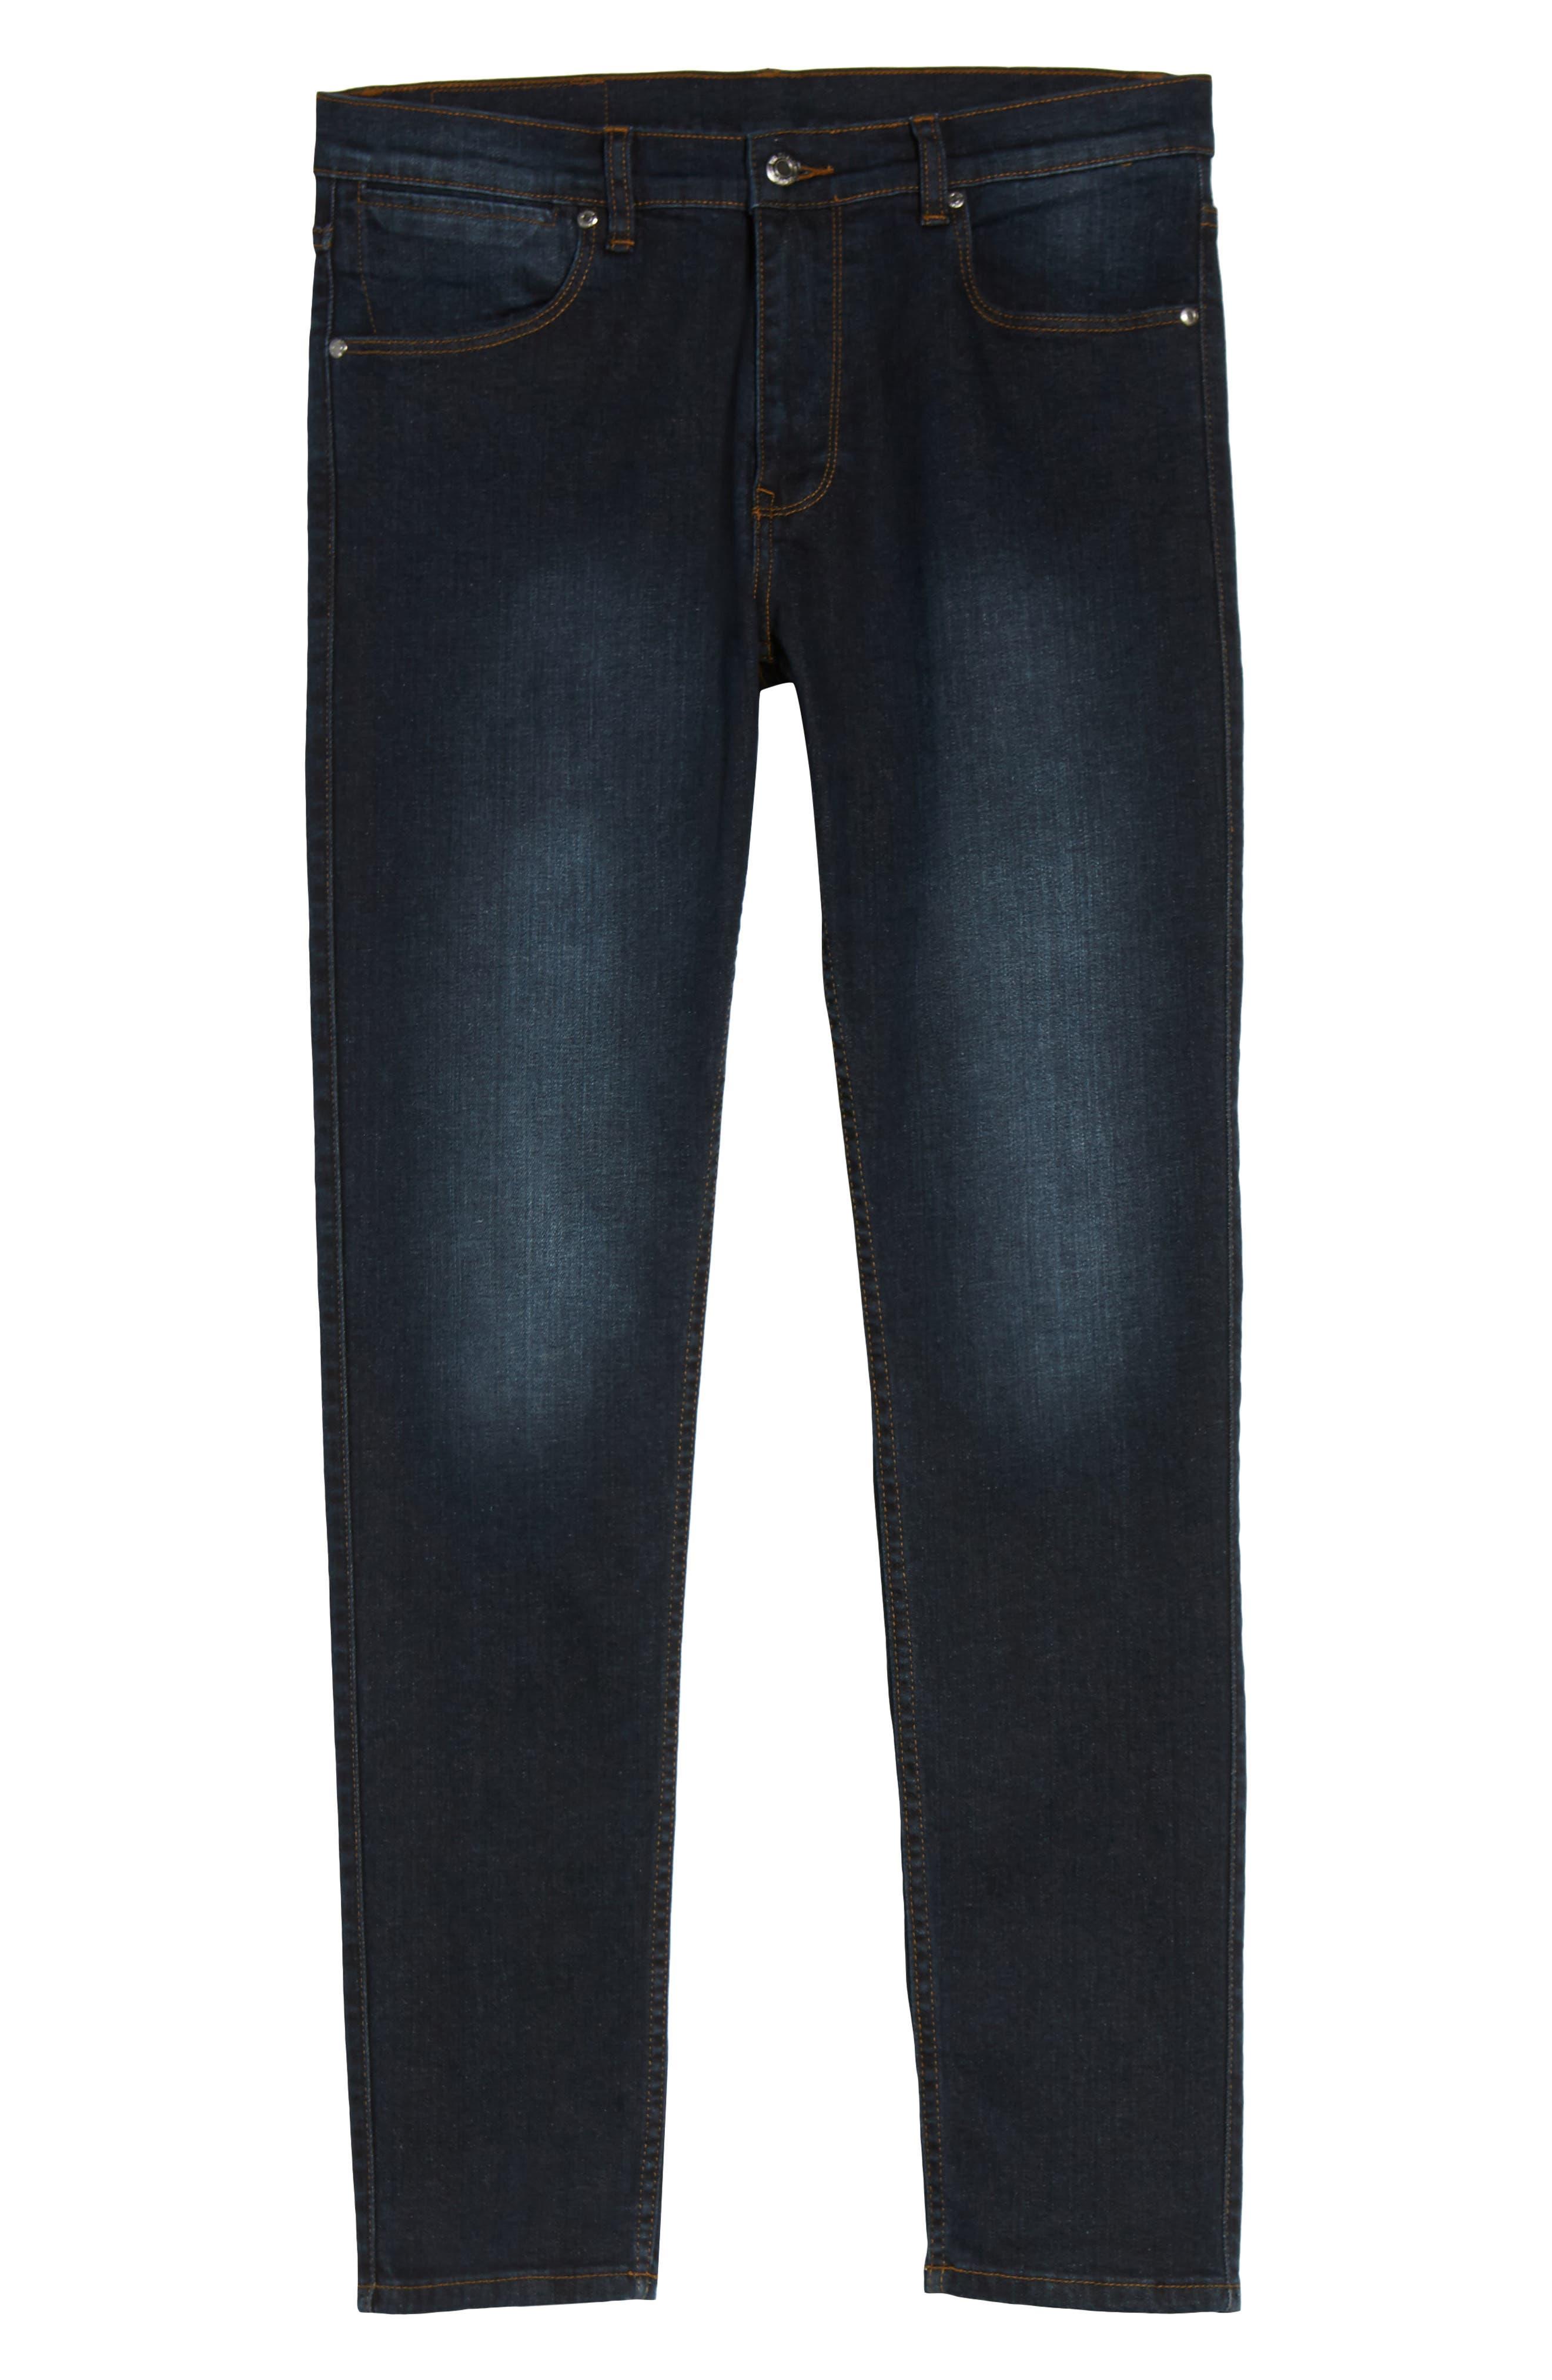 Clark Sim Straight Fit Jeans,                             Alternate thumbnail 6, color,                             Worn Dark Blue